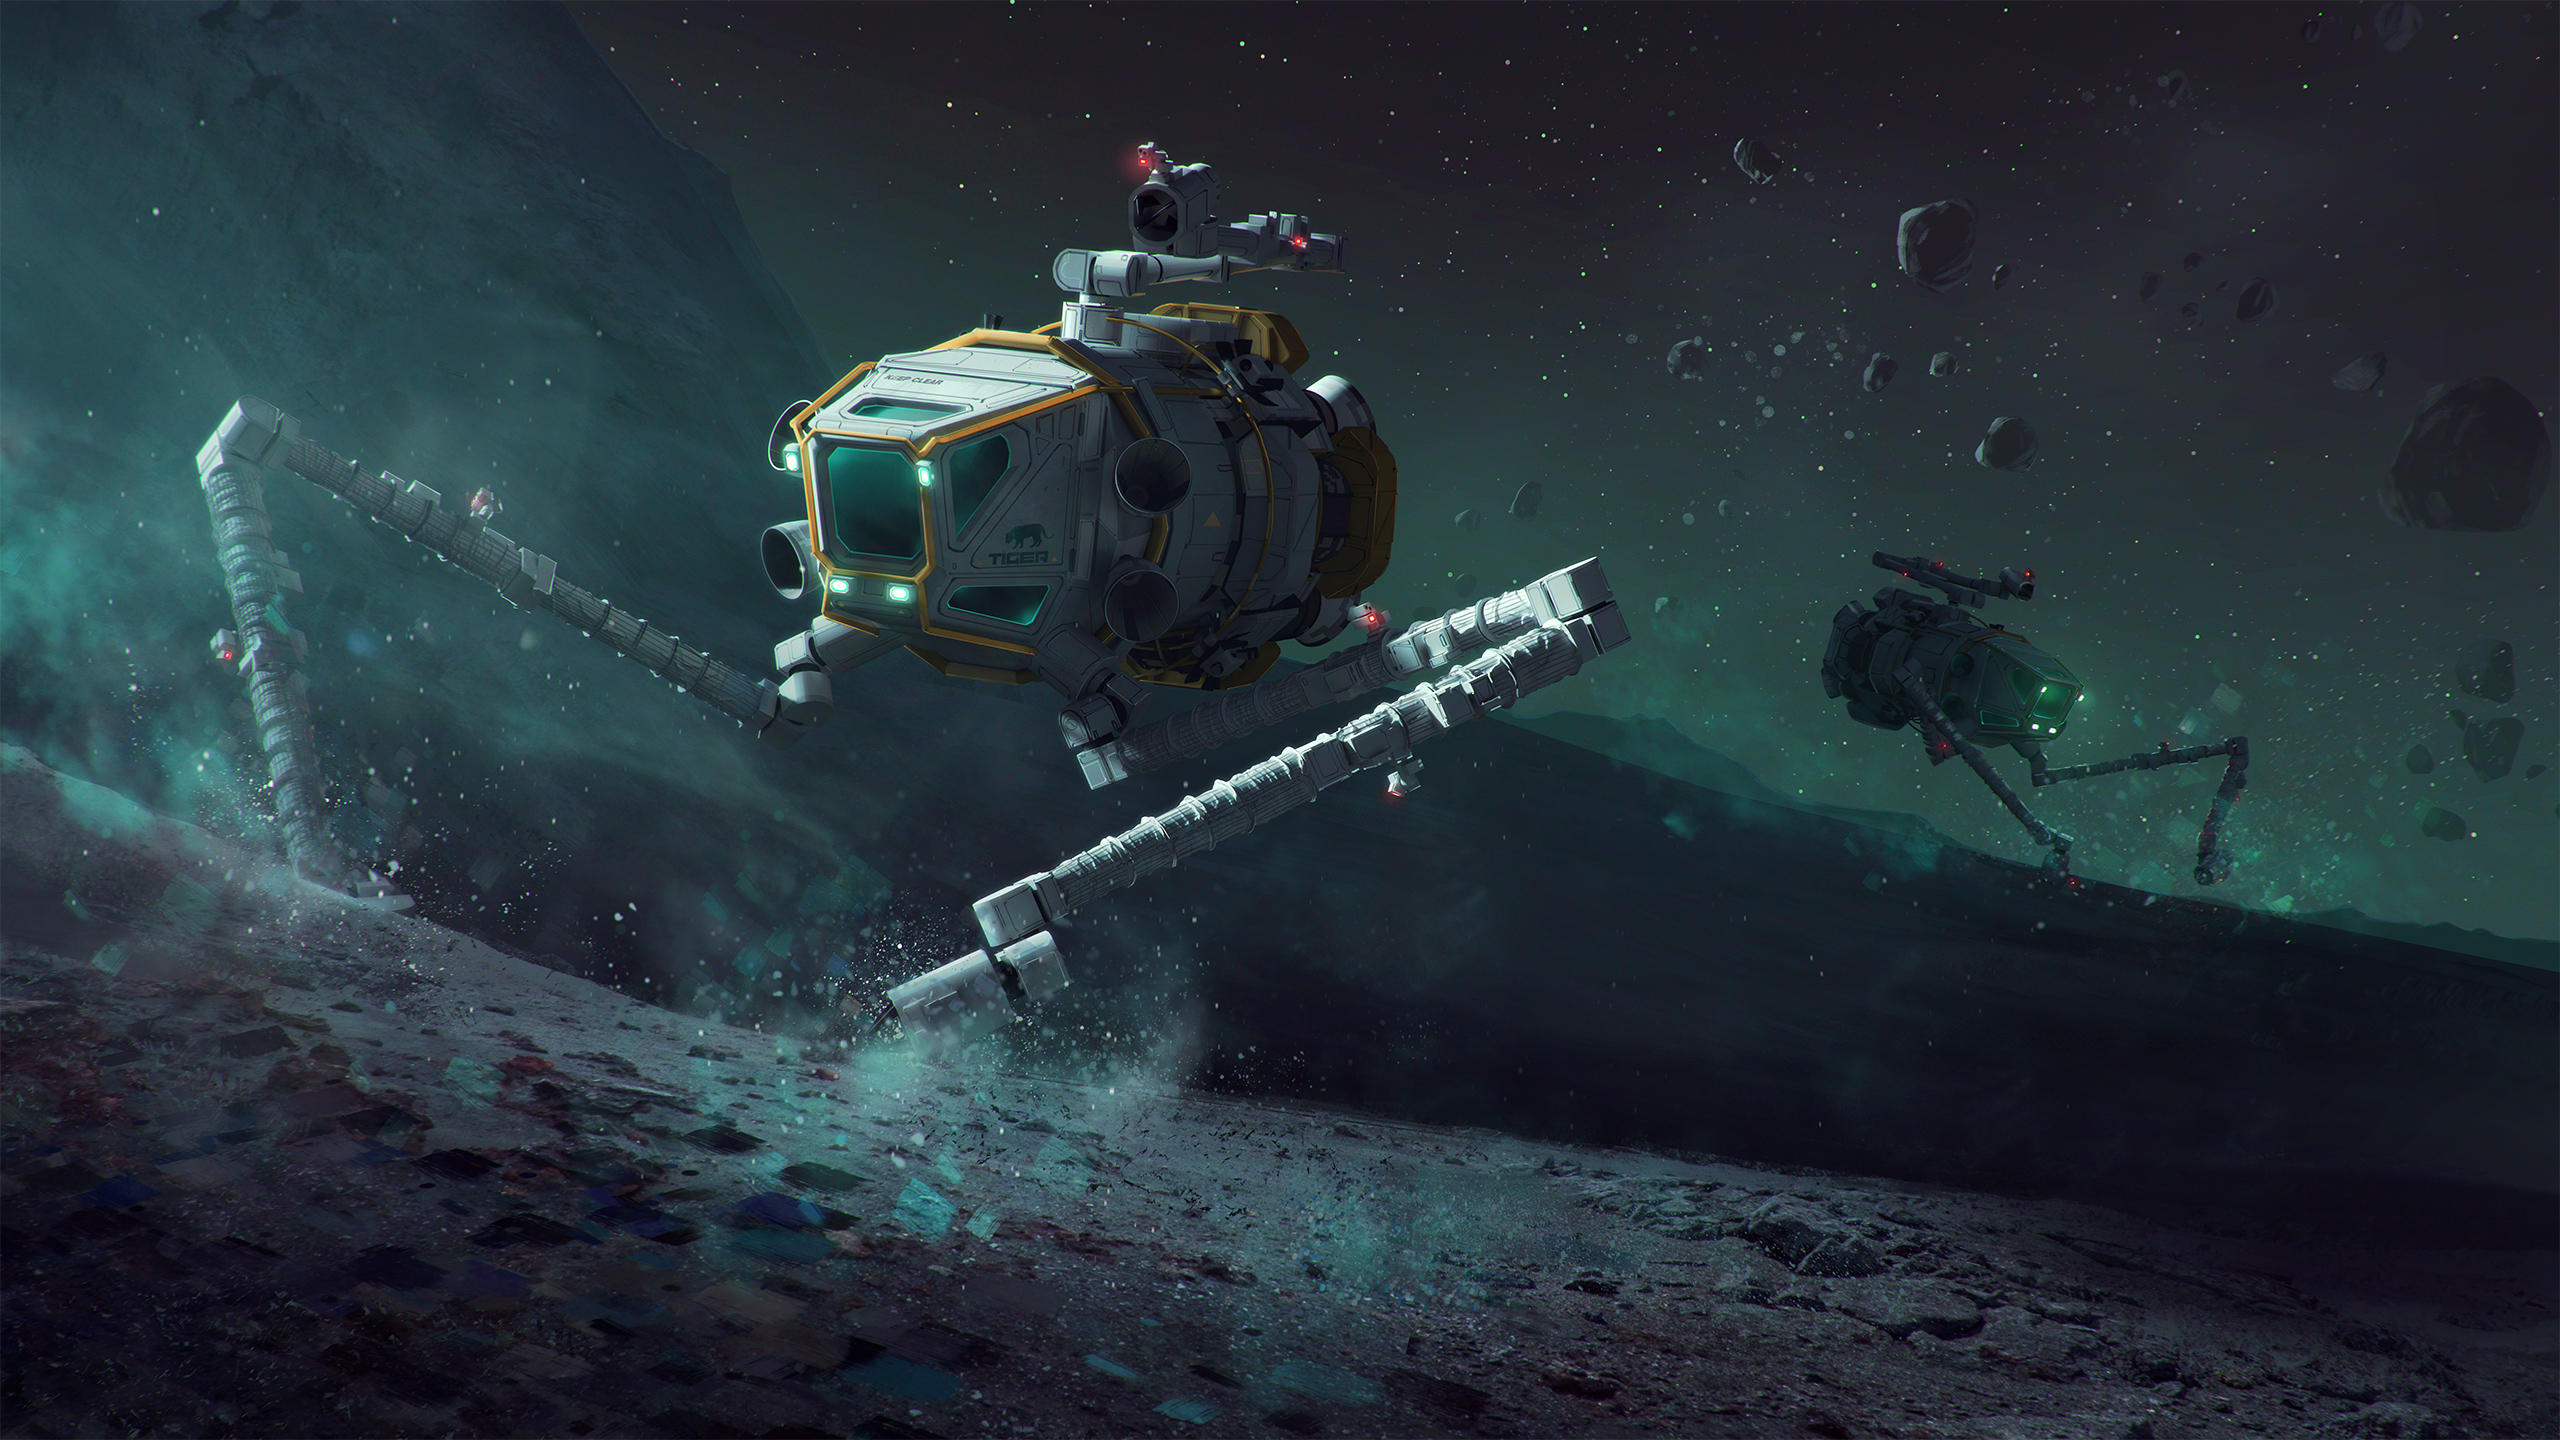 Prosperous Universe: Asteroid Day 2017 by MacRebisz